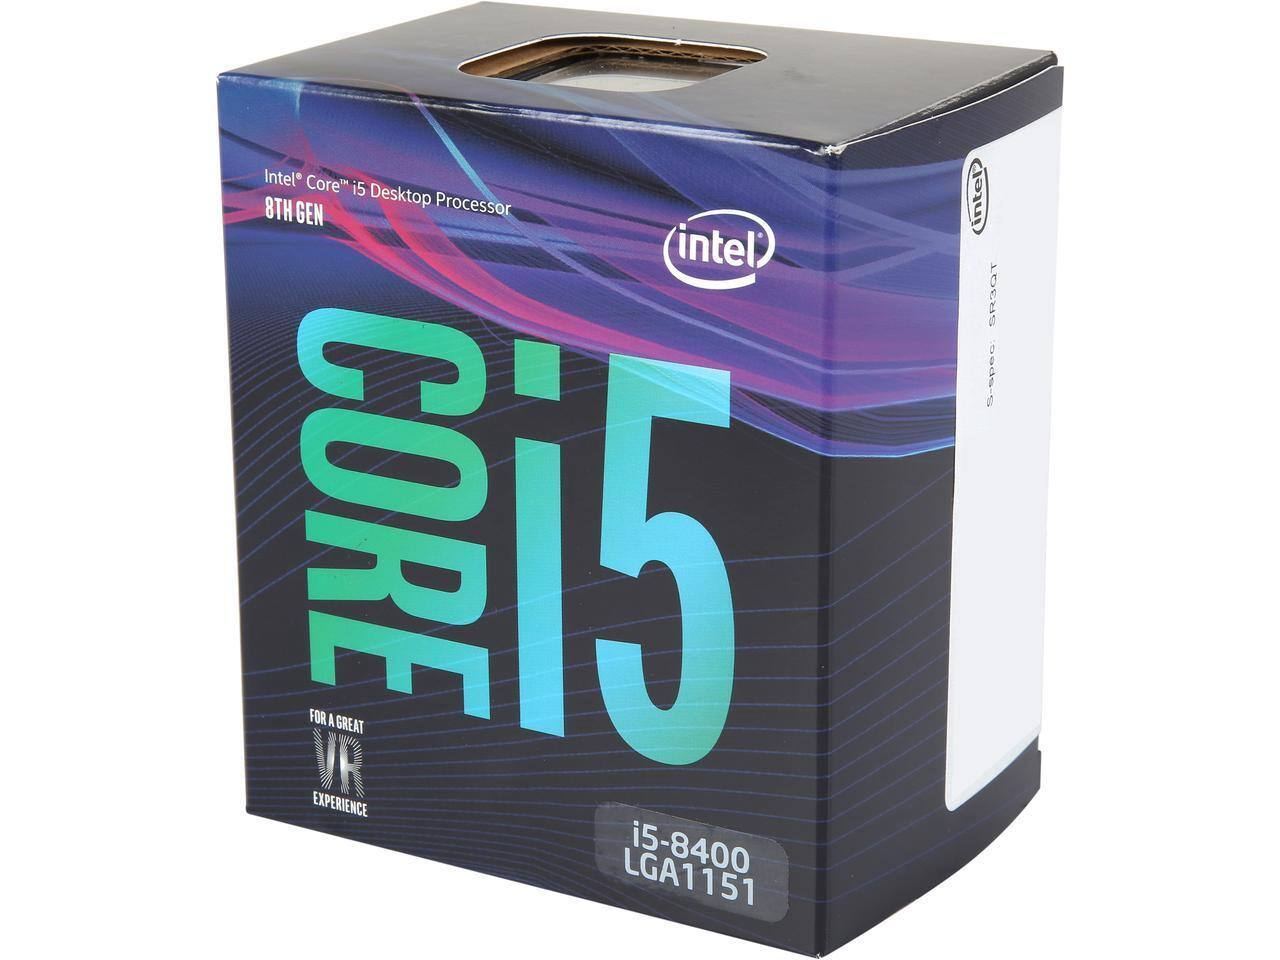 Intel Core i5-8400 Coffee Lake 6-Core 2.8 GHz (4.0 GHz Turbo) LGA 1151 (300 Series) 65W BX80684I58400 Desktop Processor Intel UHD Graphics 630 $164.99